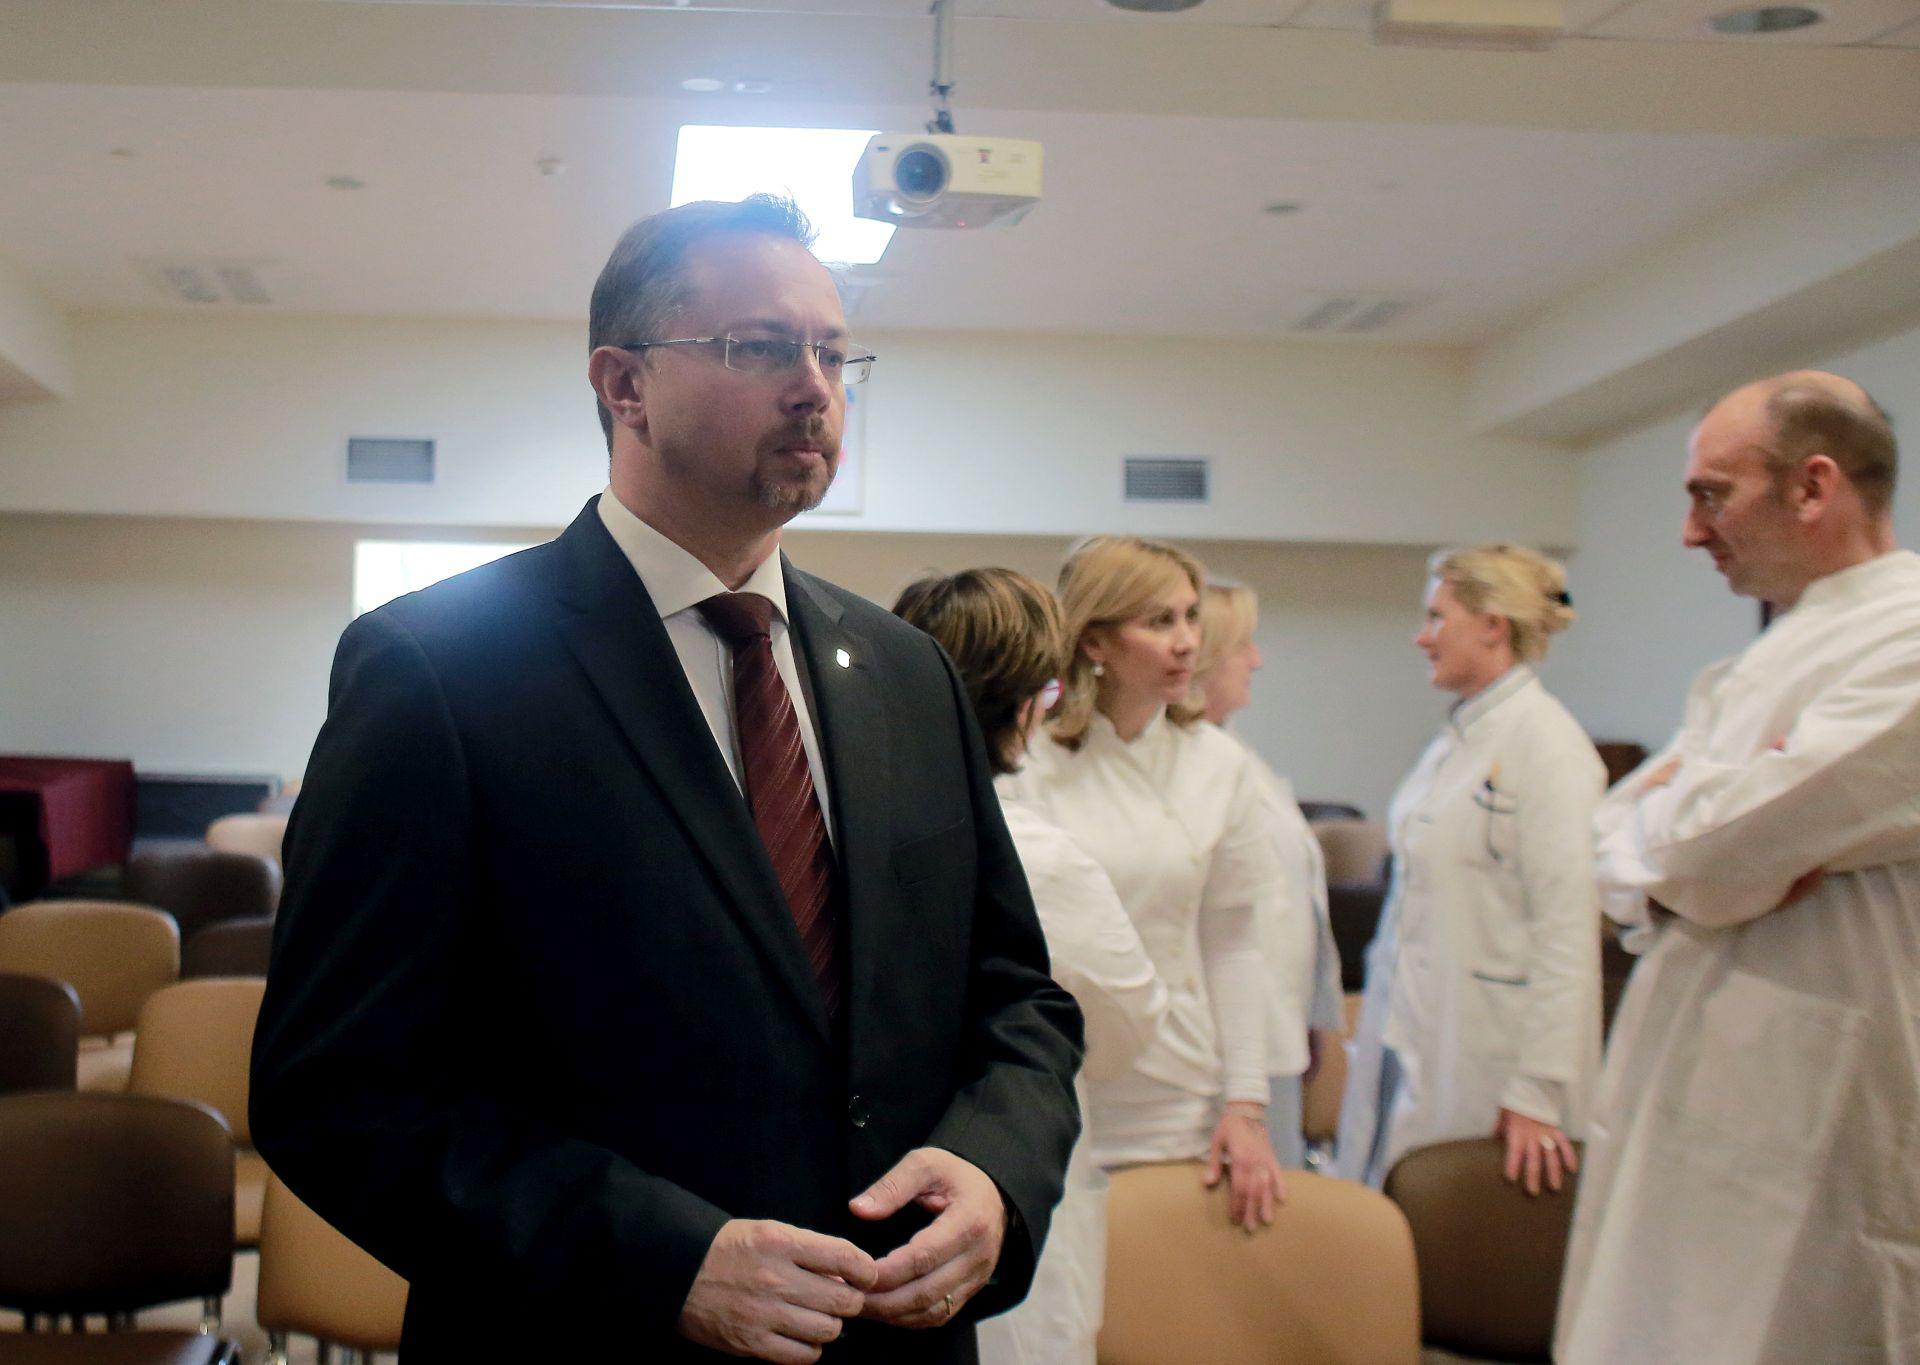 PREVENTIVNI PREGLED: Ministar Varga nezadovoljan odzivom na pregled za rak debelog crijeva